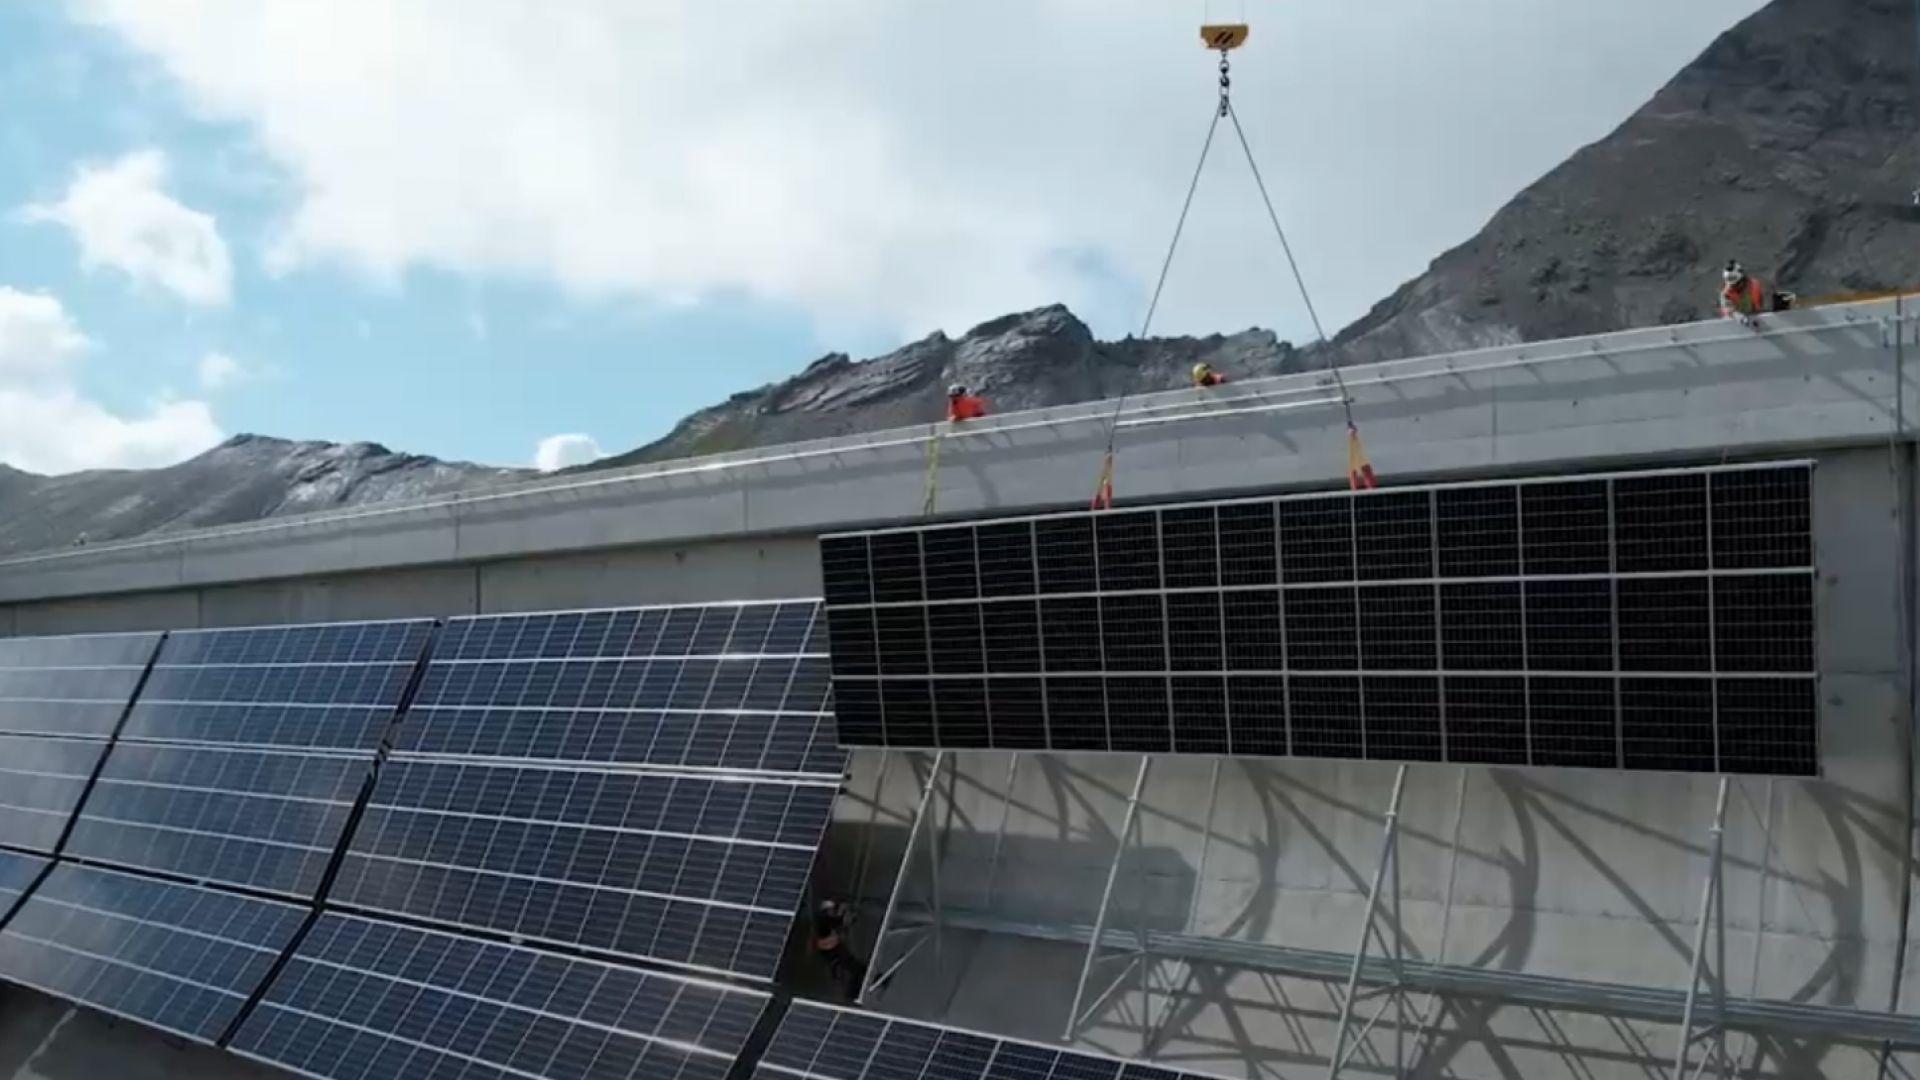 Швейцария строи огромна слънчева електроцентрала в Алпите (видео)